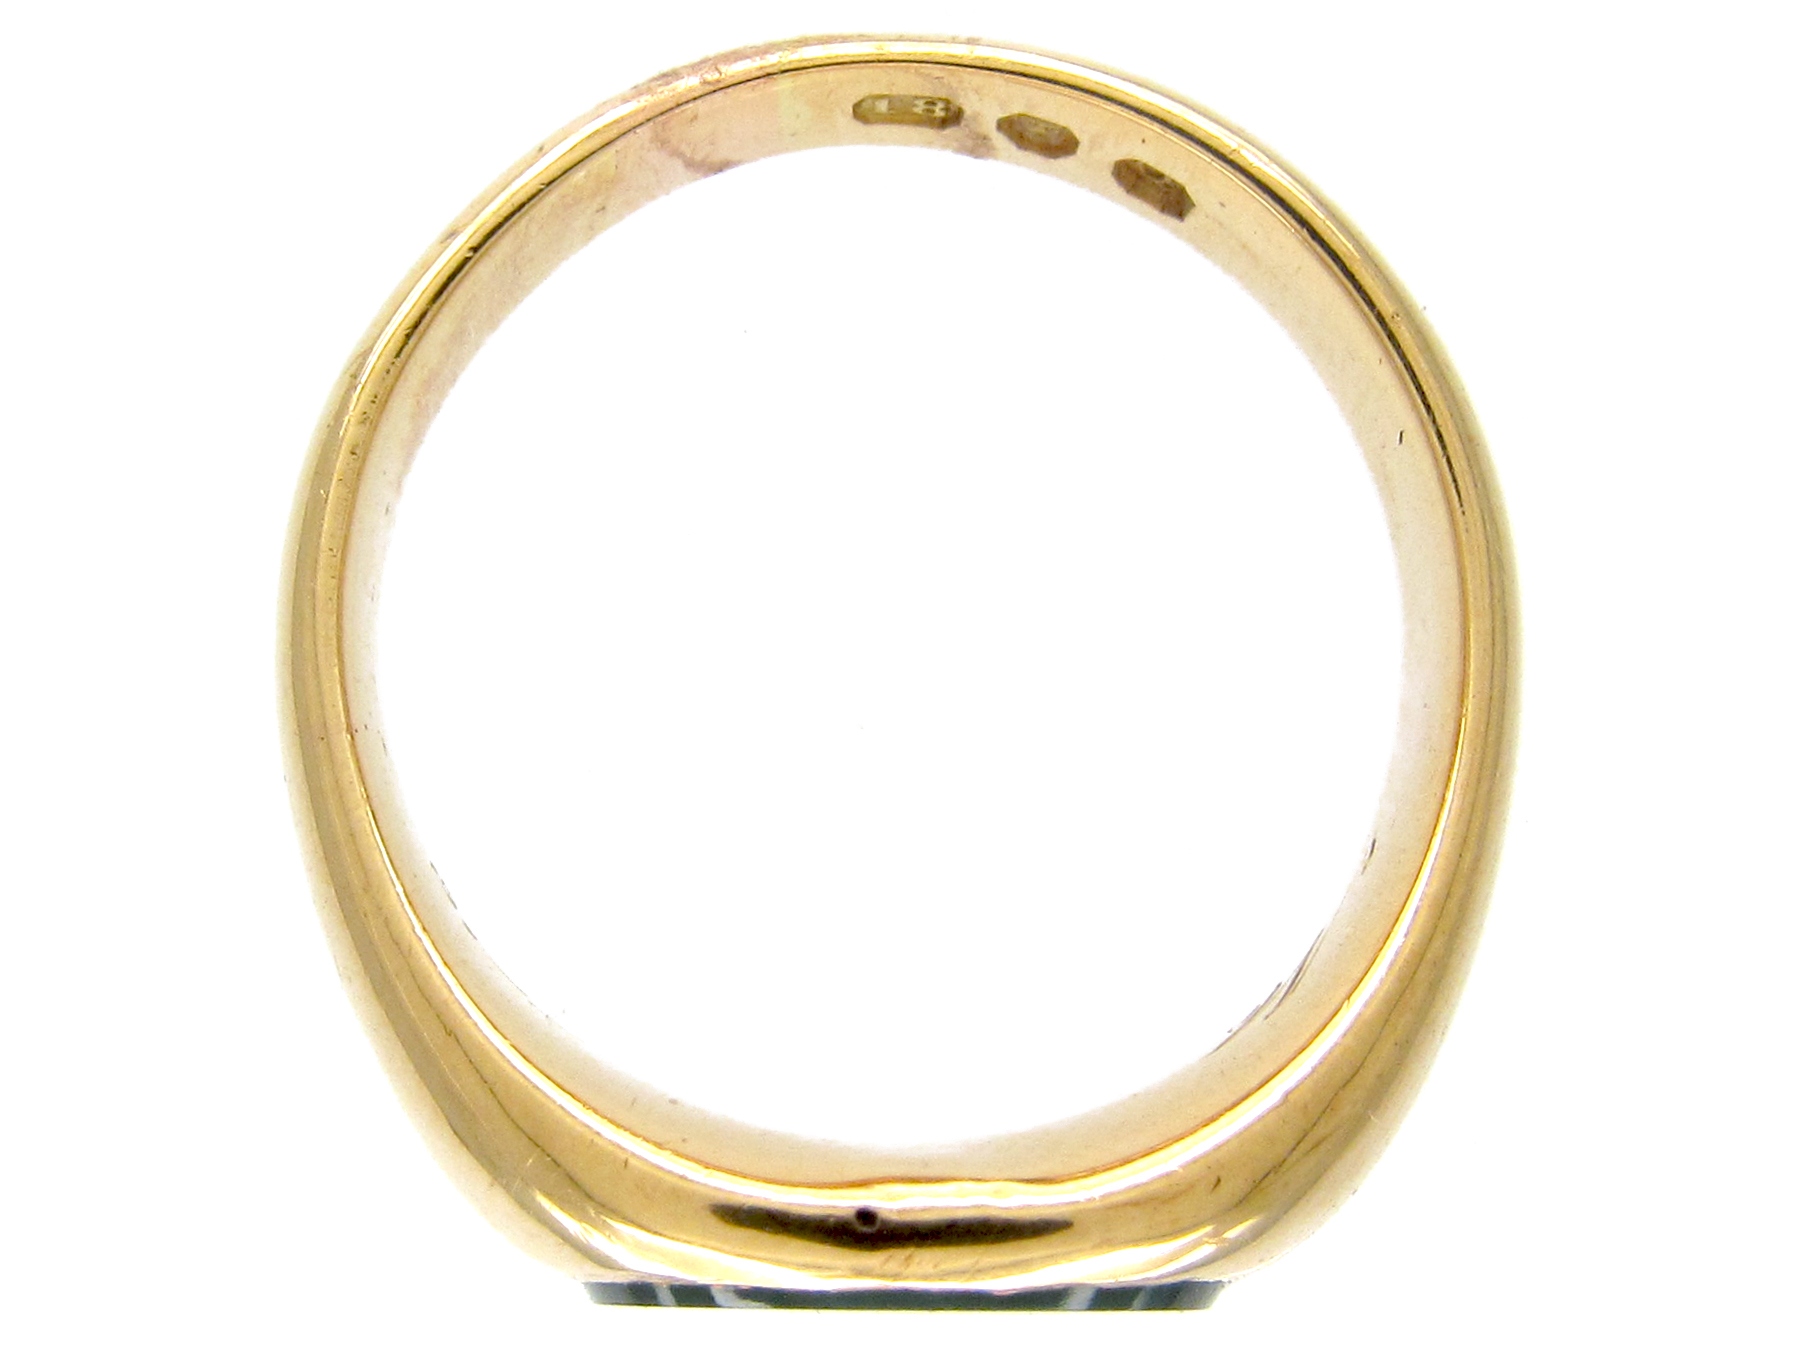 18ct Gold & Bloodstone Signet Ring